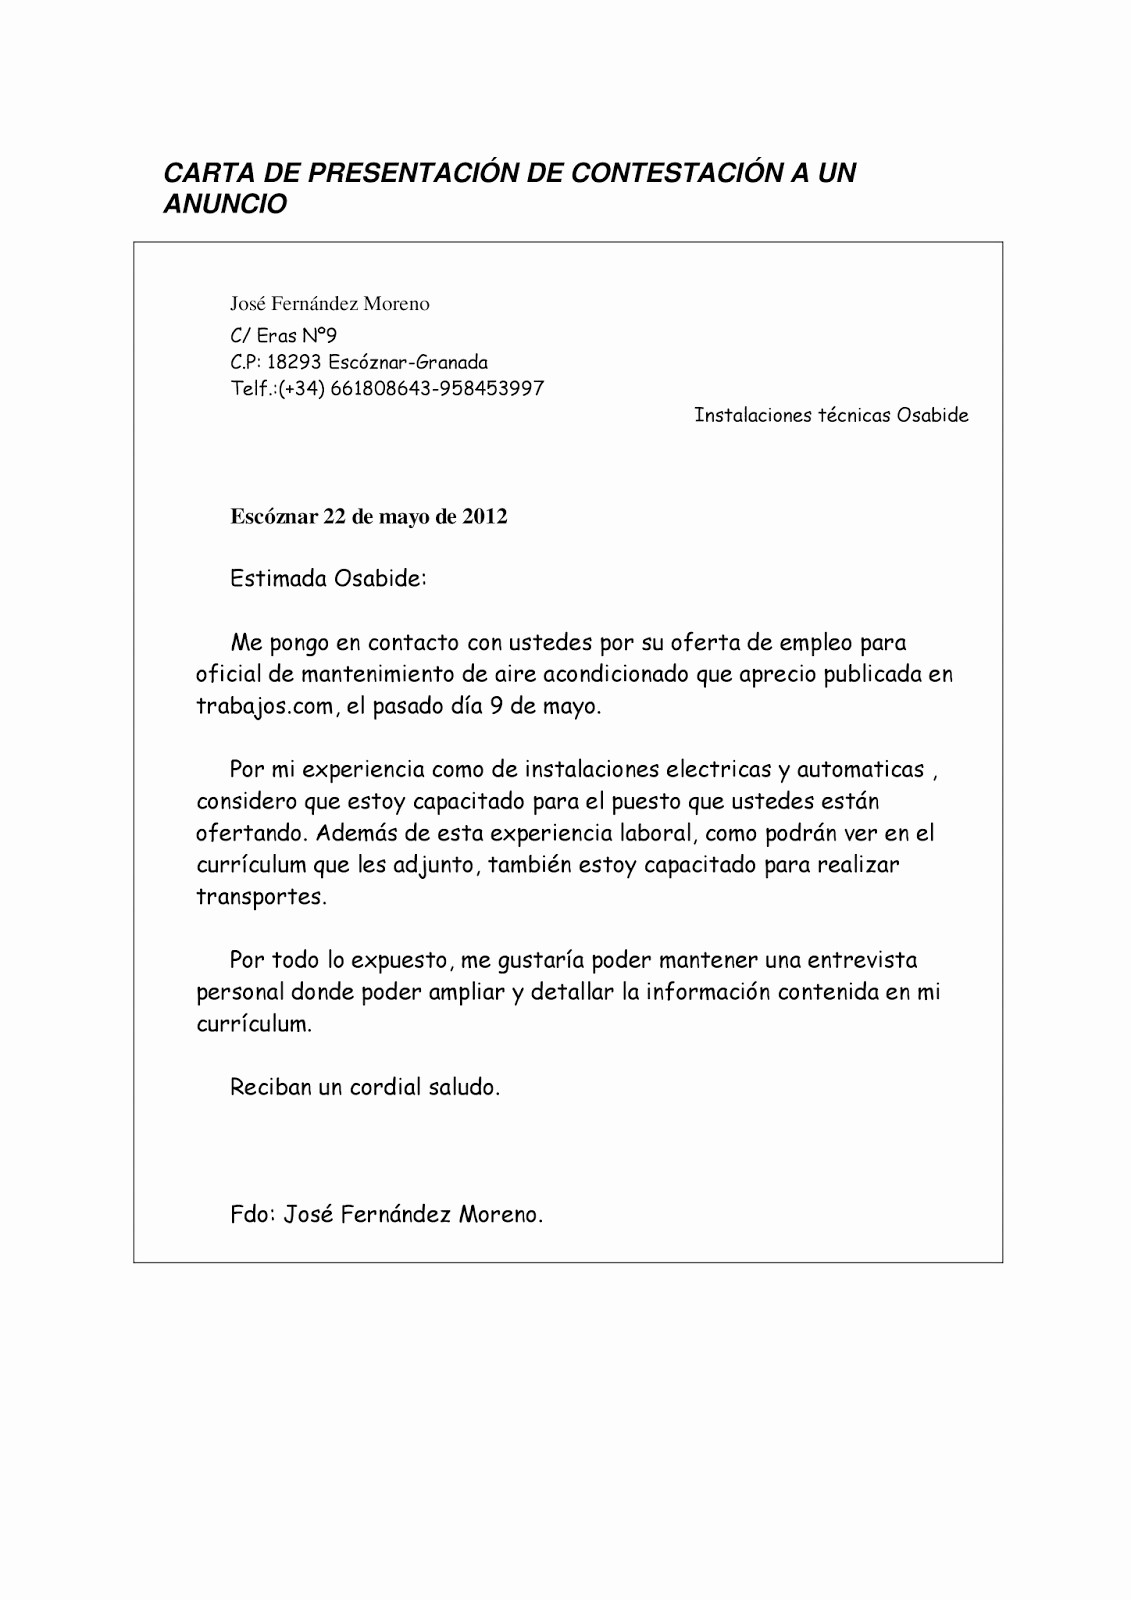 Carta De Oferta De Trabajo Best Of Mi Curriculum 5 Ofertas De Empleo Y Carta De Presentacion